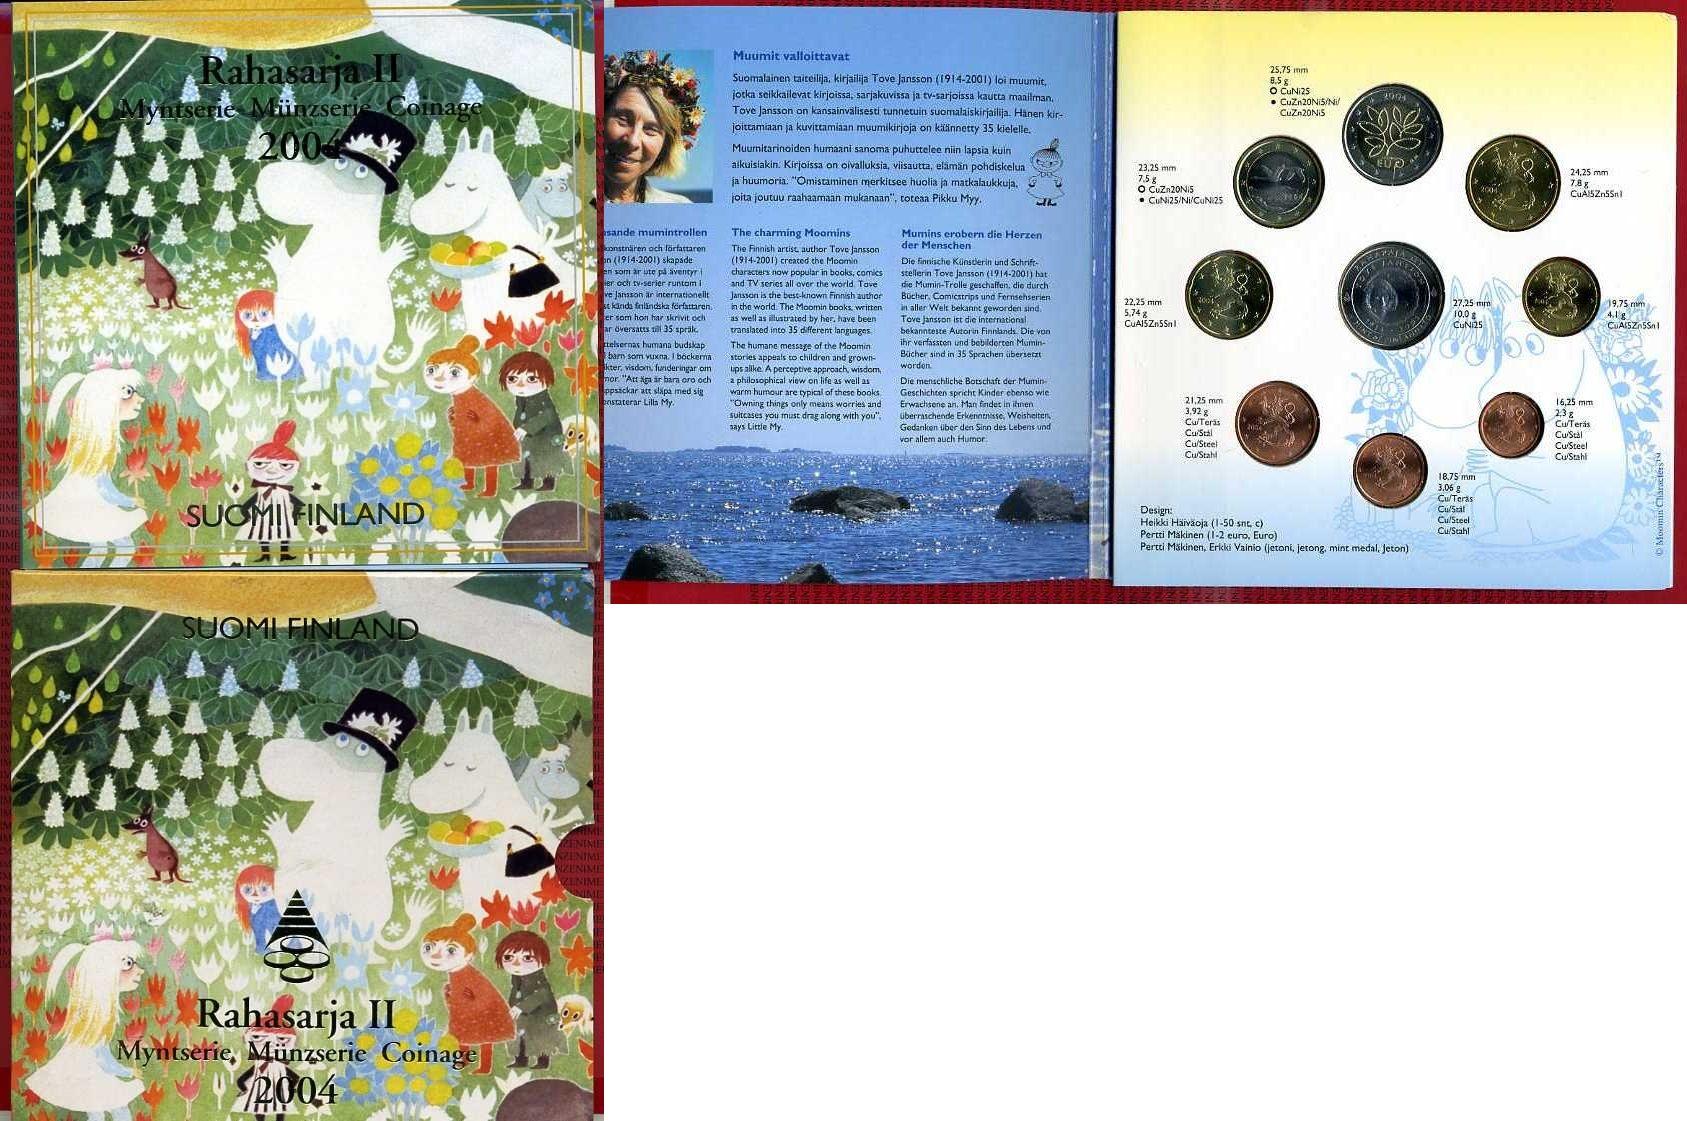 Kursmünzensatz Moomins Mumins 2004 Finnland Finland Moomins Set